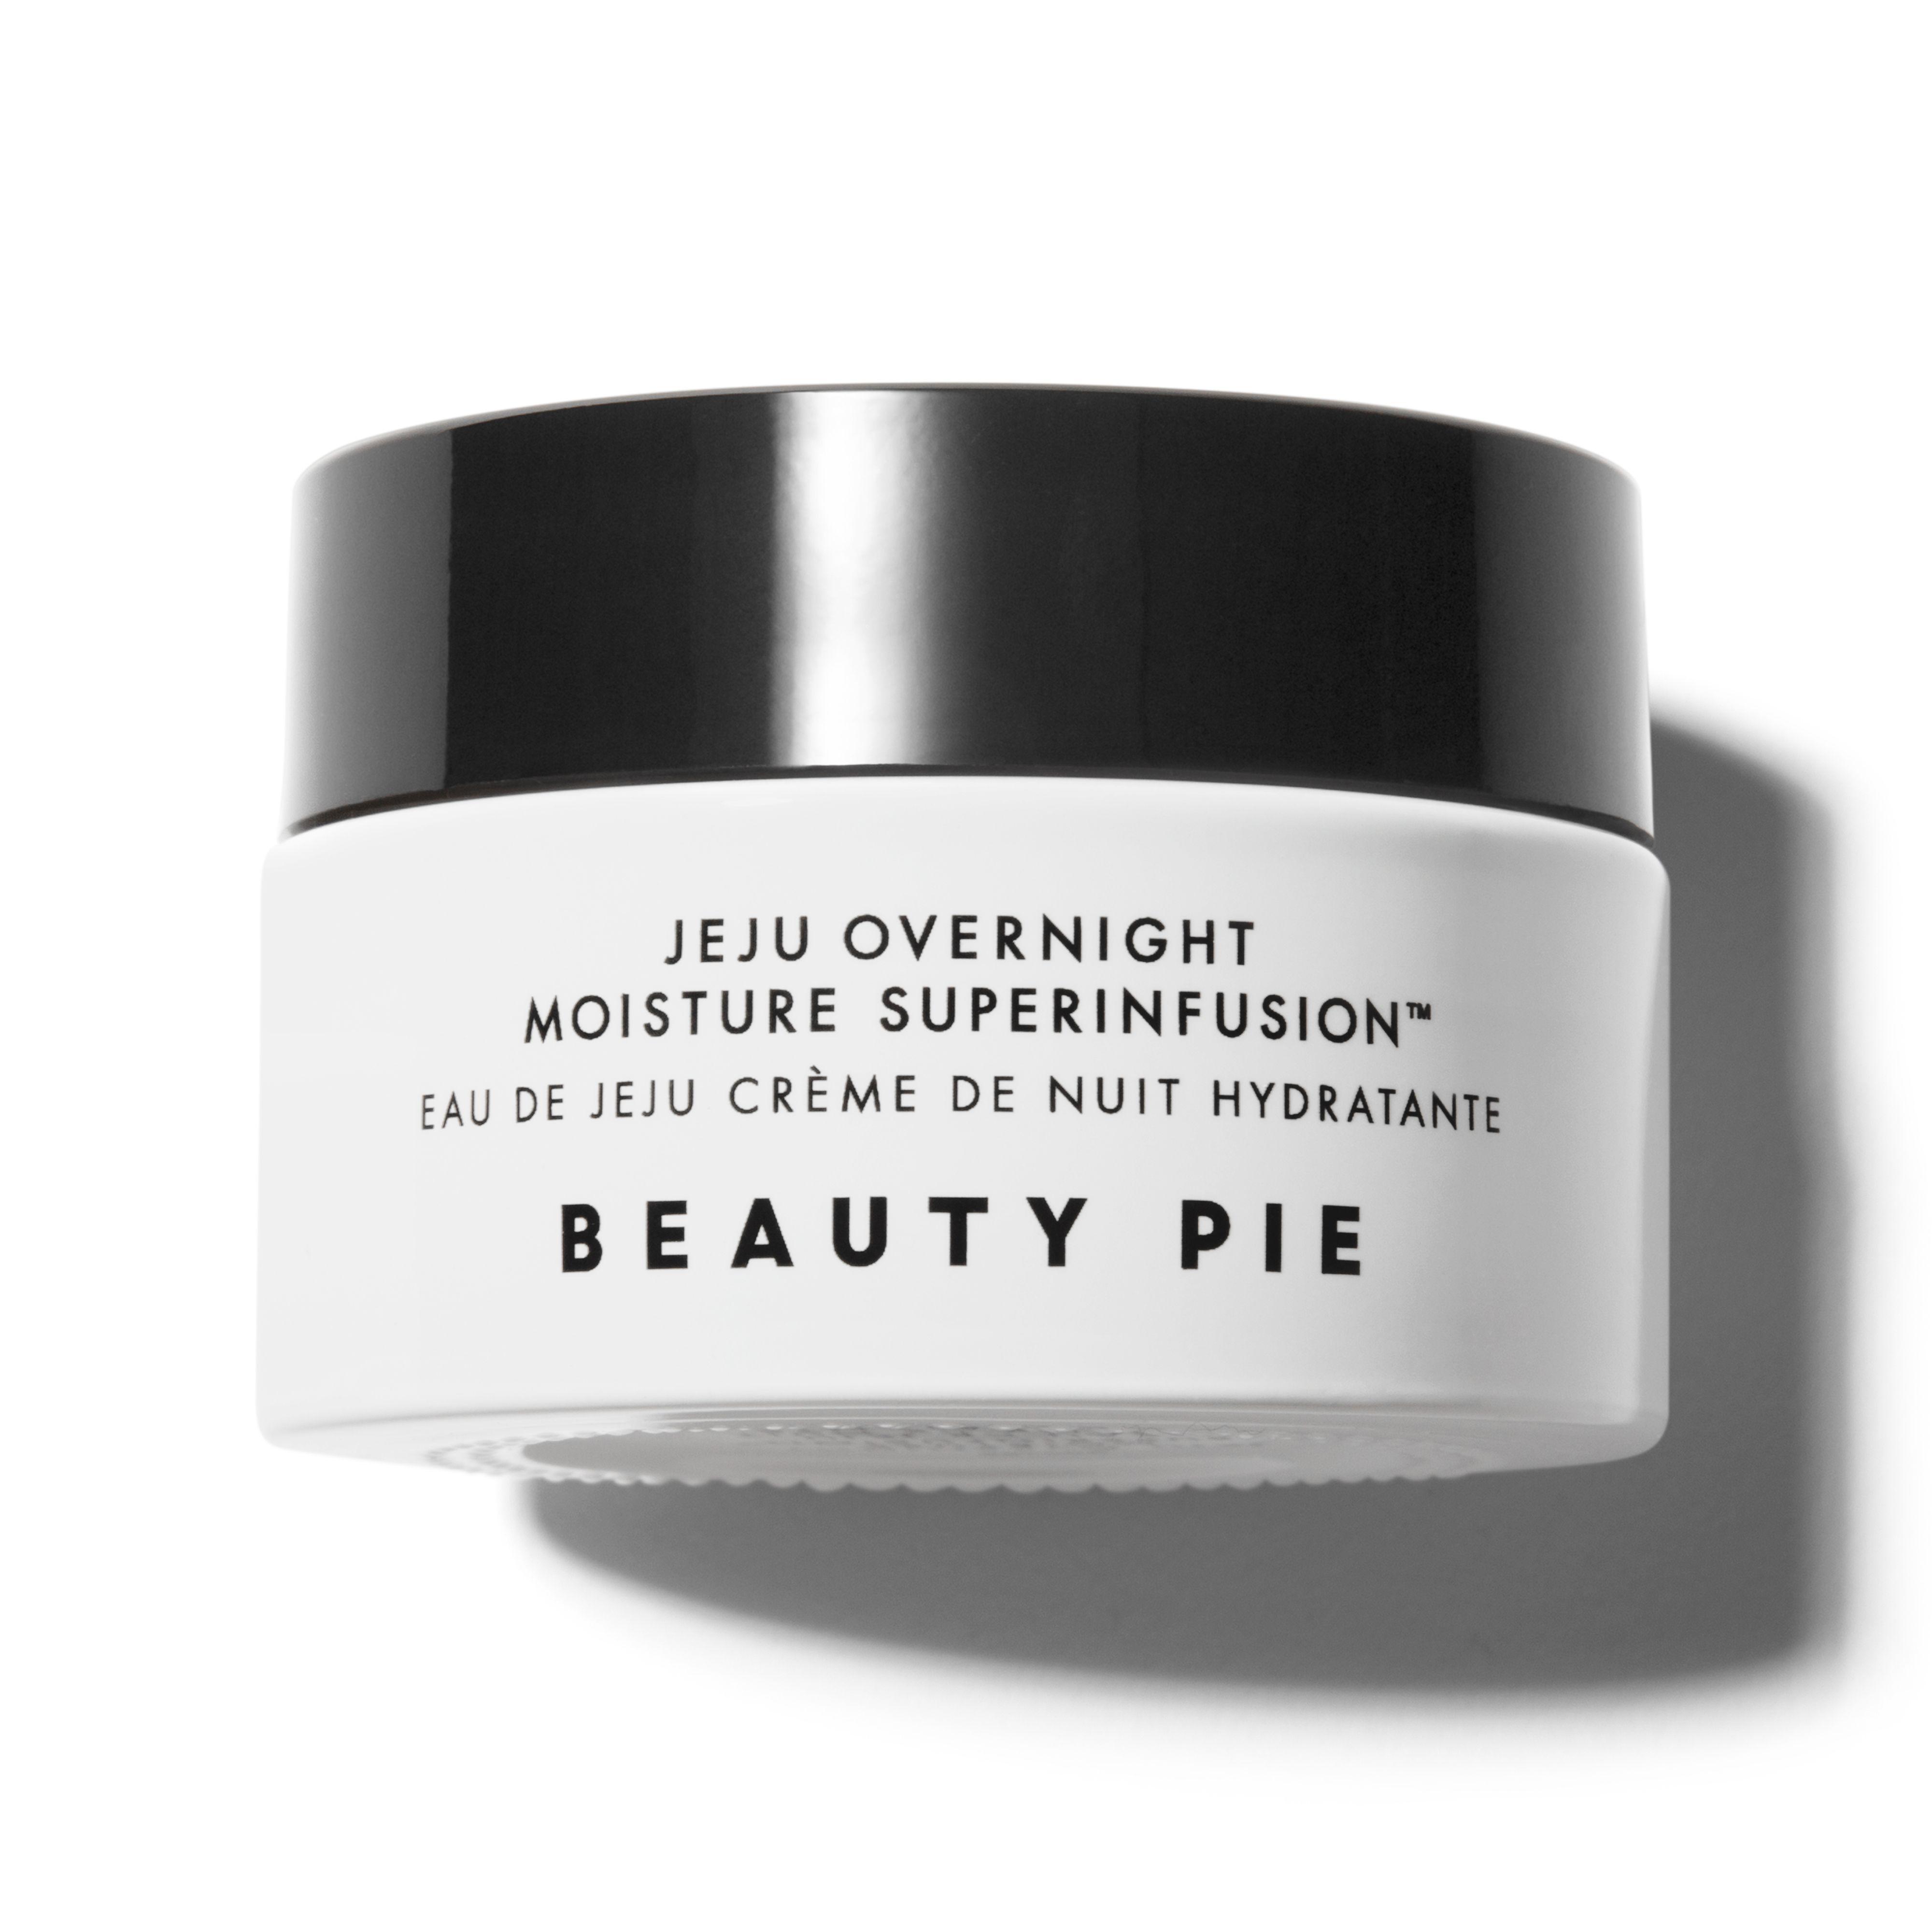 Jeju Overnight Moisture Superfusion™ Beauty Pie